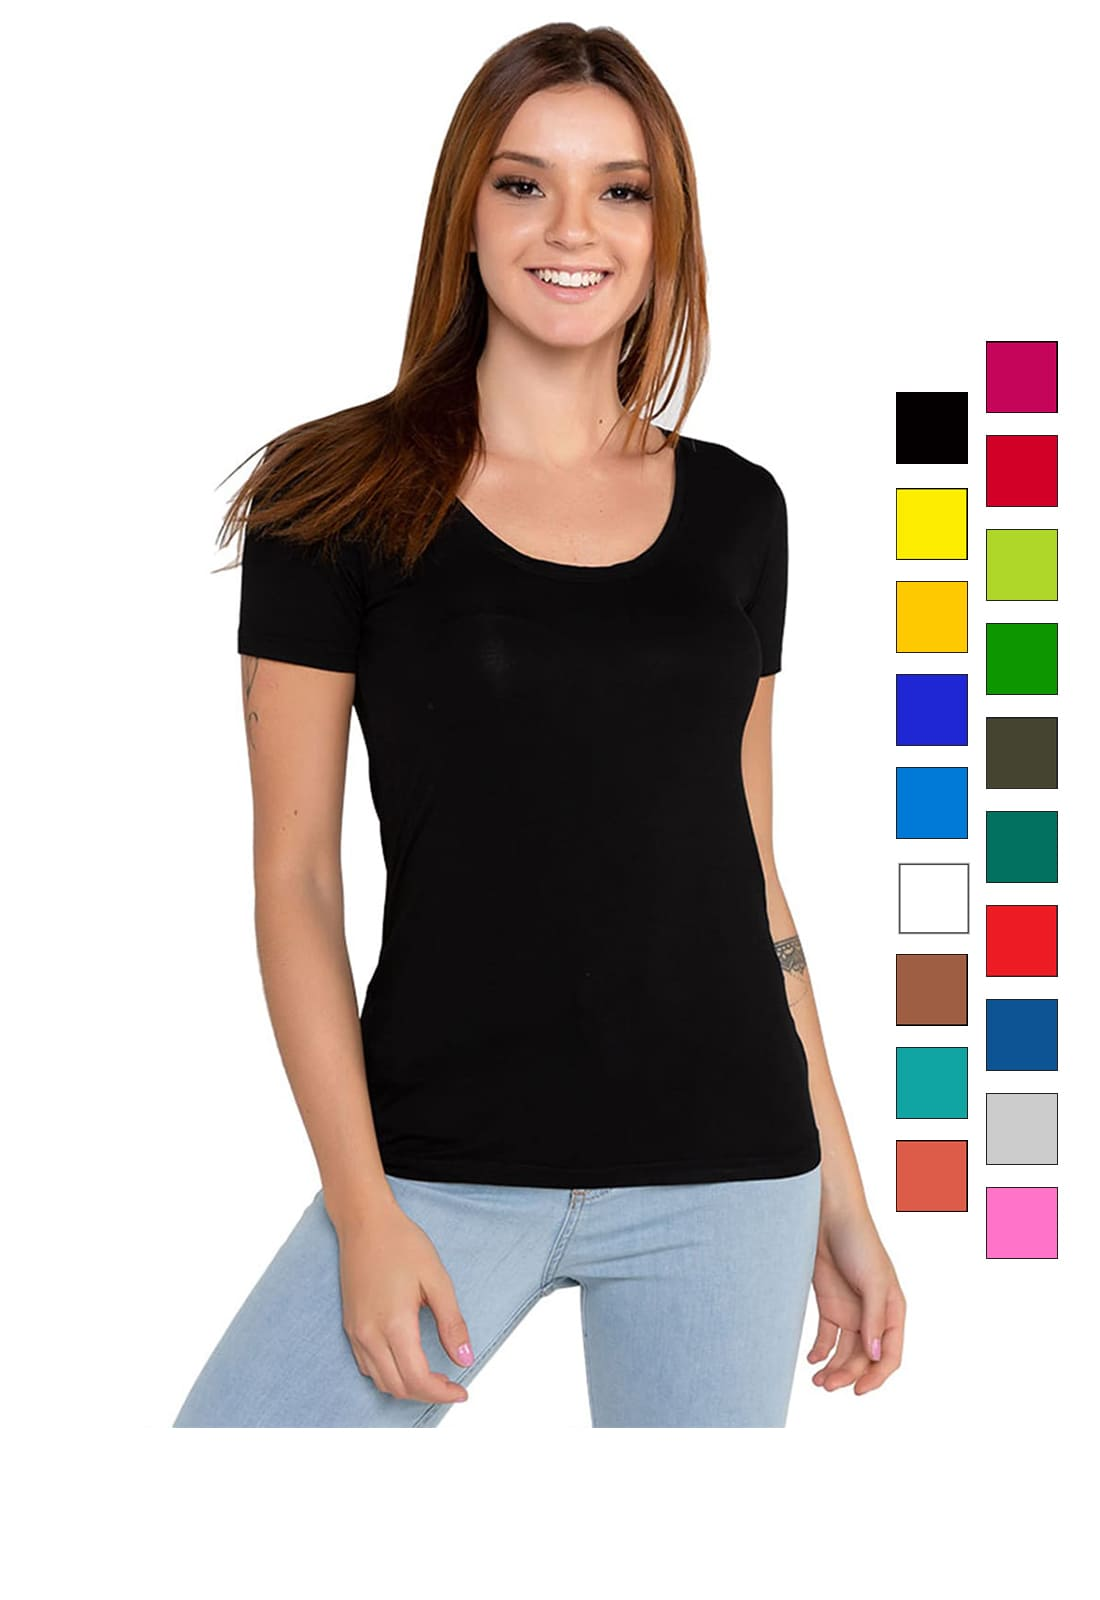 Blusa Camiseta Feminina Manga Curta Latifundio